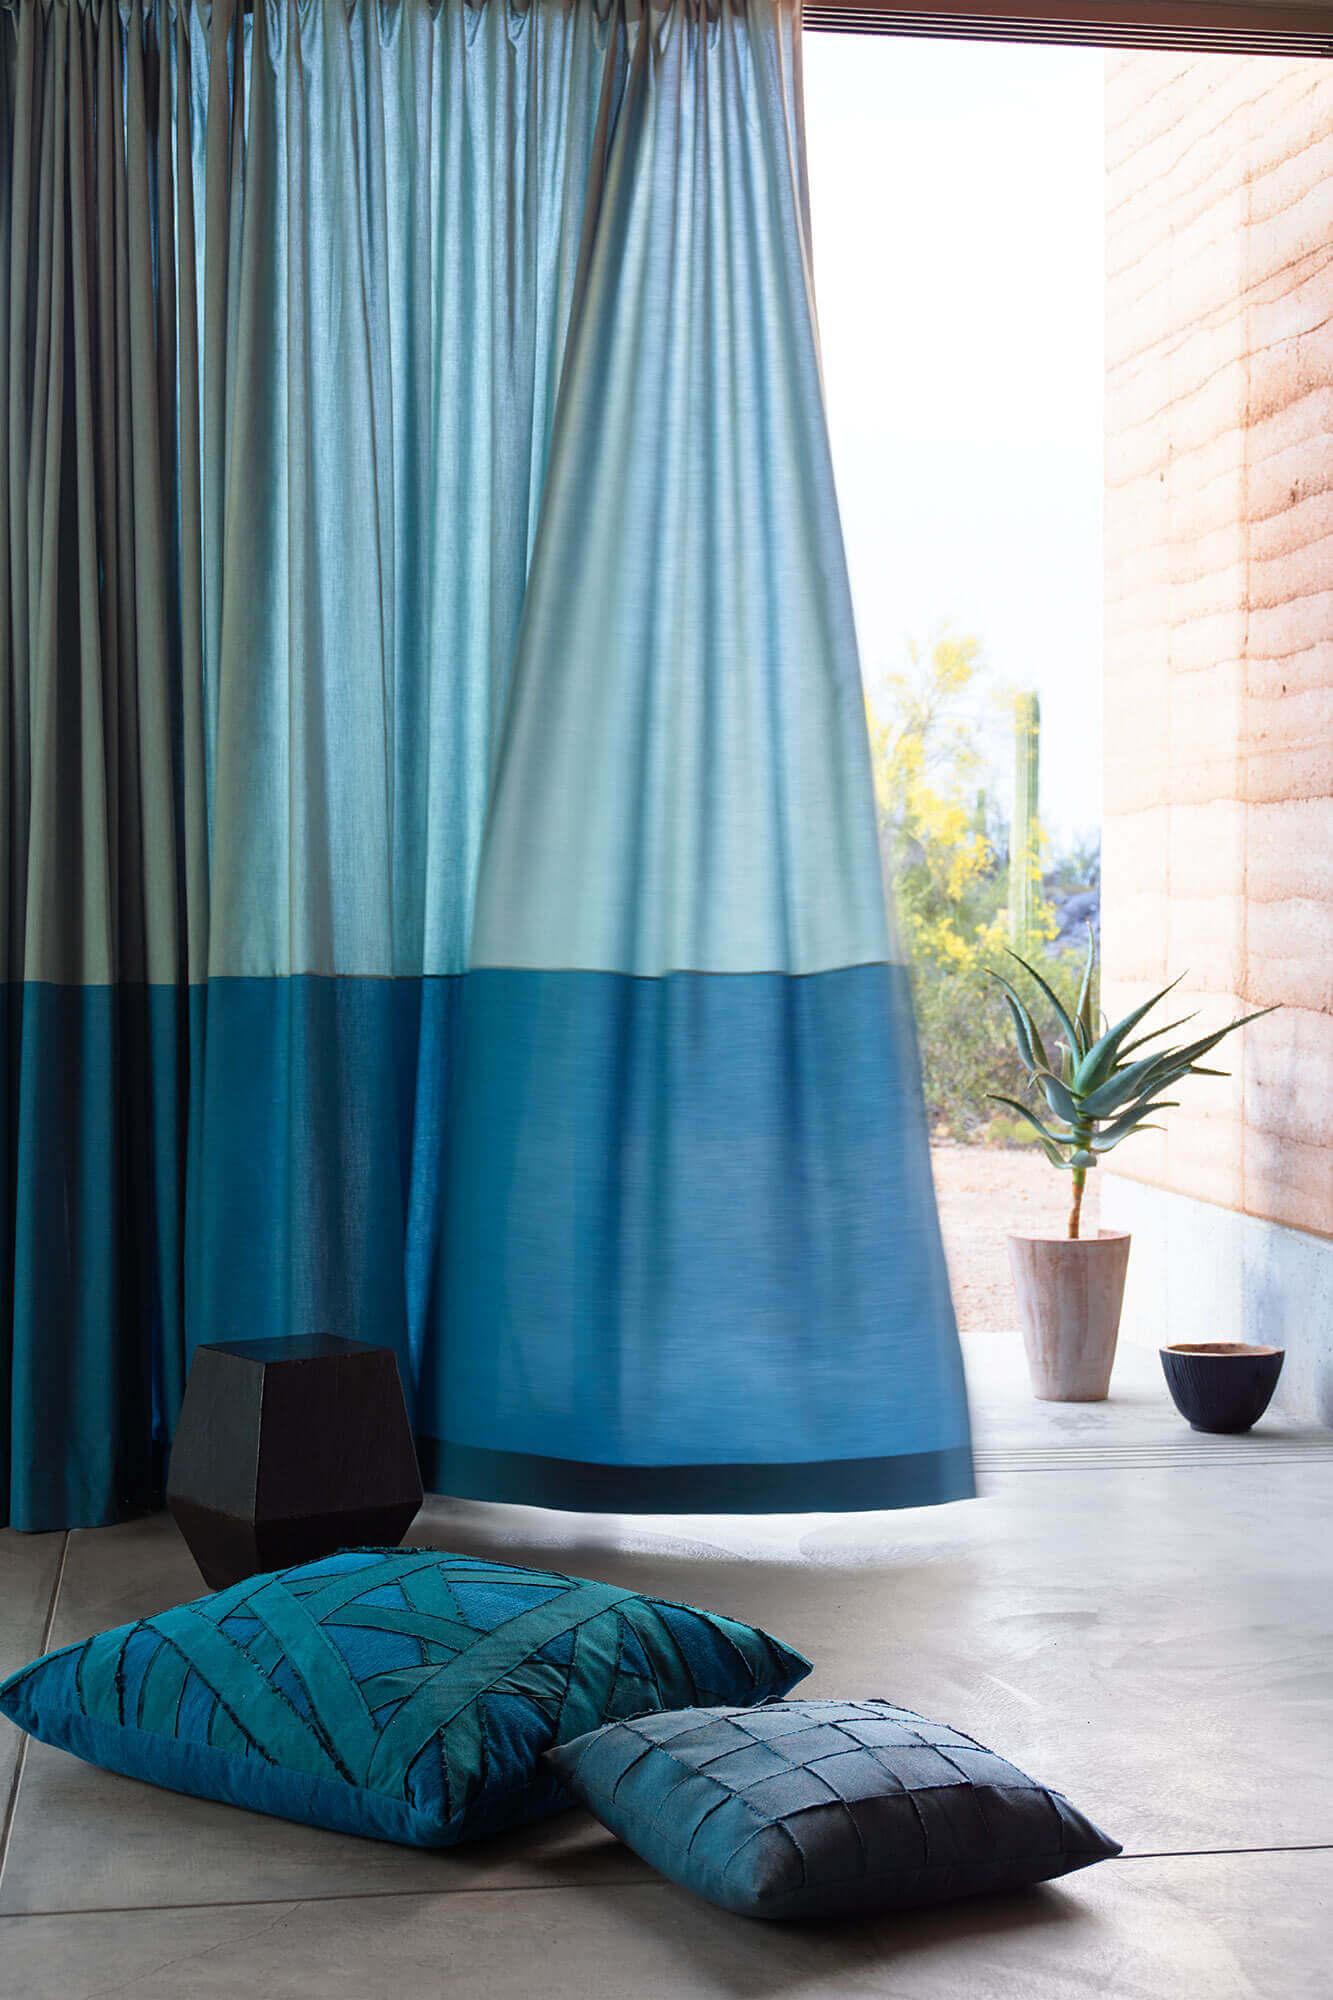 Fabrics For The Home – Indoor & Outdoor Fabrics – Sunbrella Inside Matine Indoor/outdoor Curtain Panels (View 17 of 20)